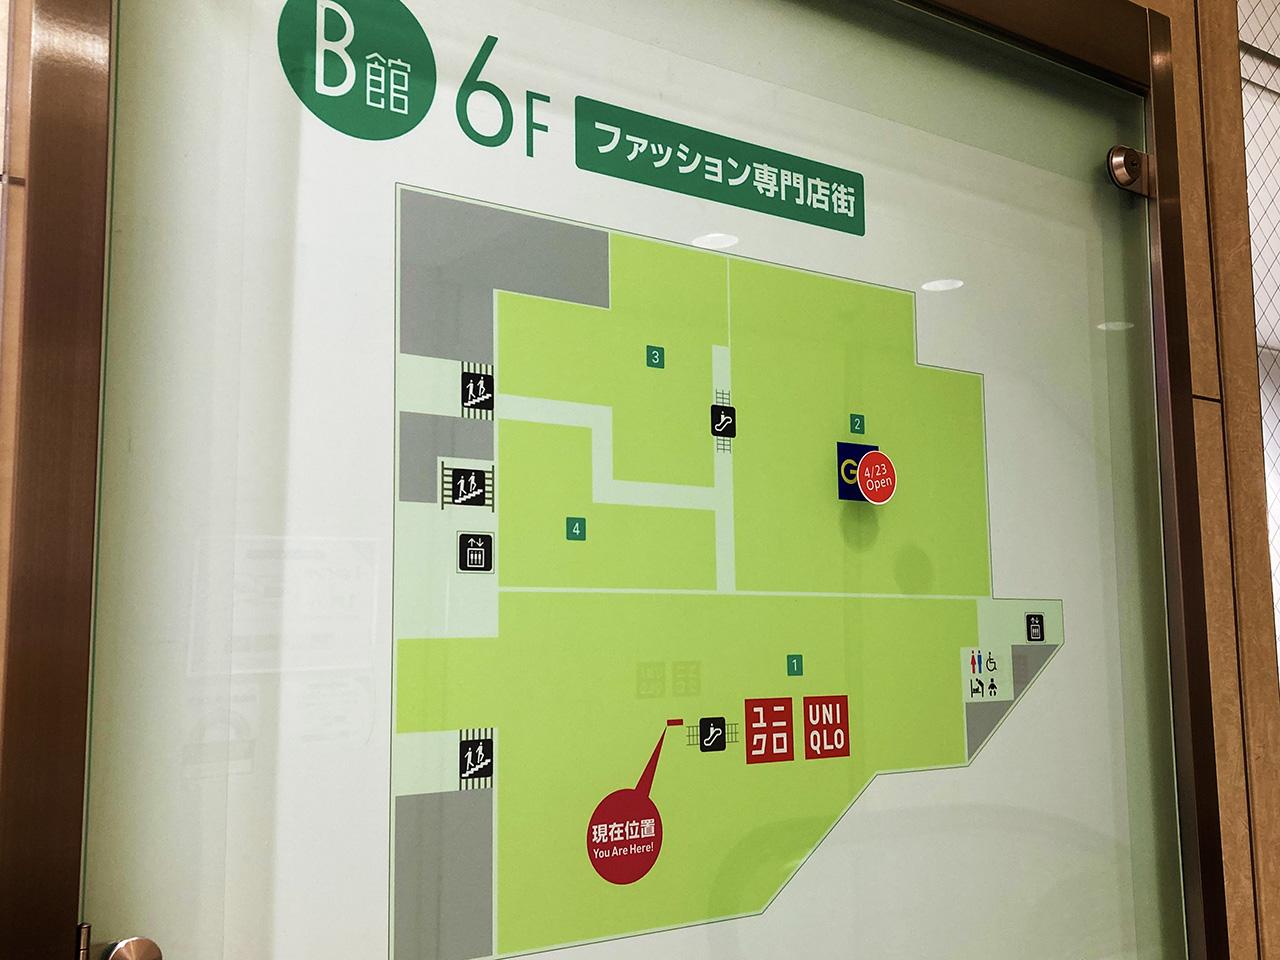 GU京王聖蹟桜ケ丘店が4/23移転オープン!それに伴いGU聖蹟桜ケ丘OPA店は閉店セール実施中